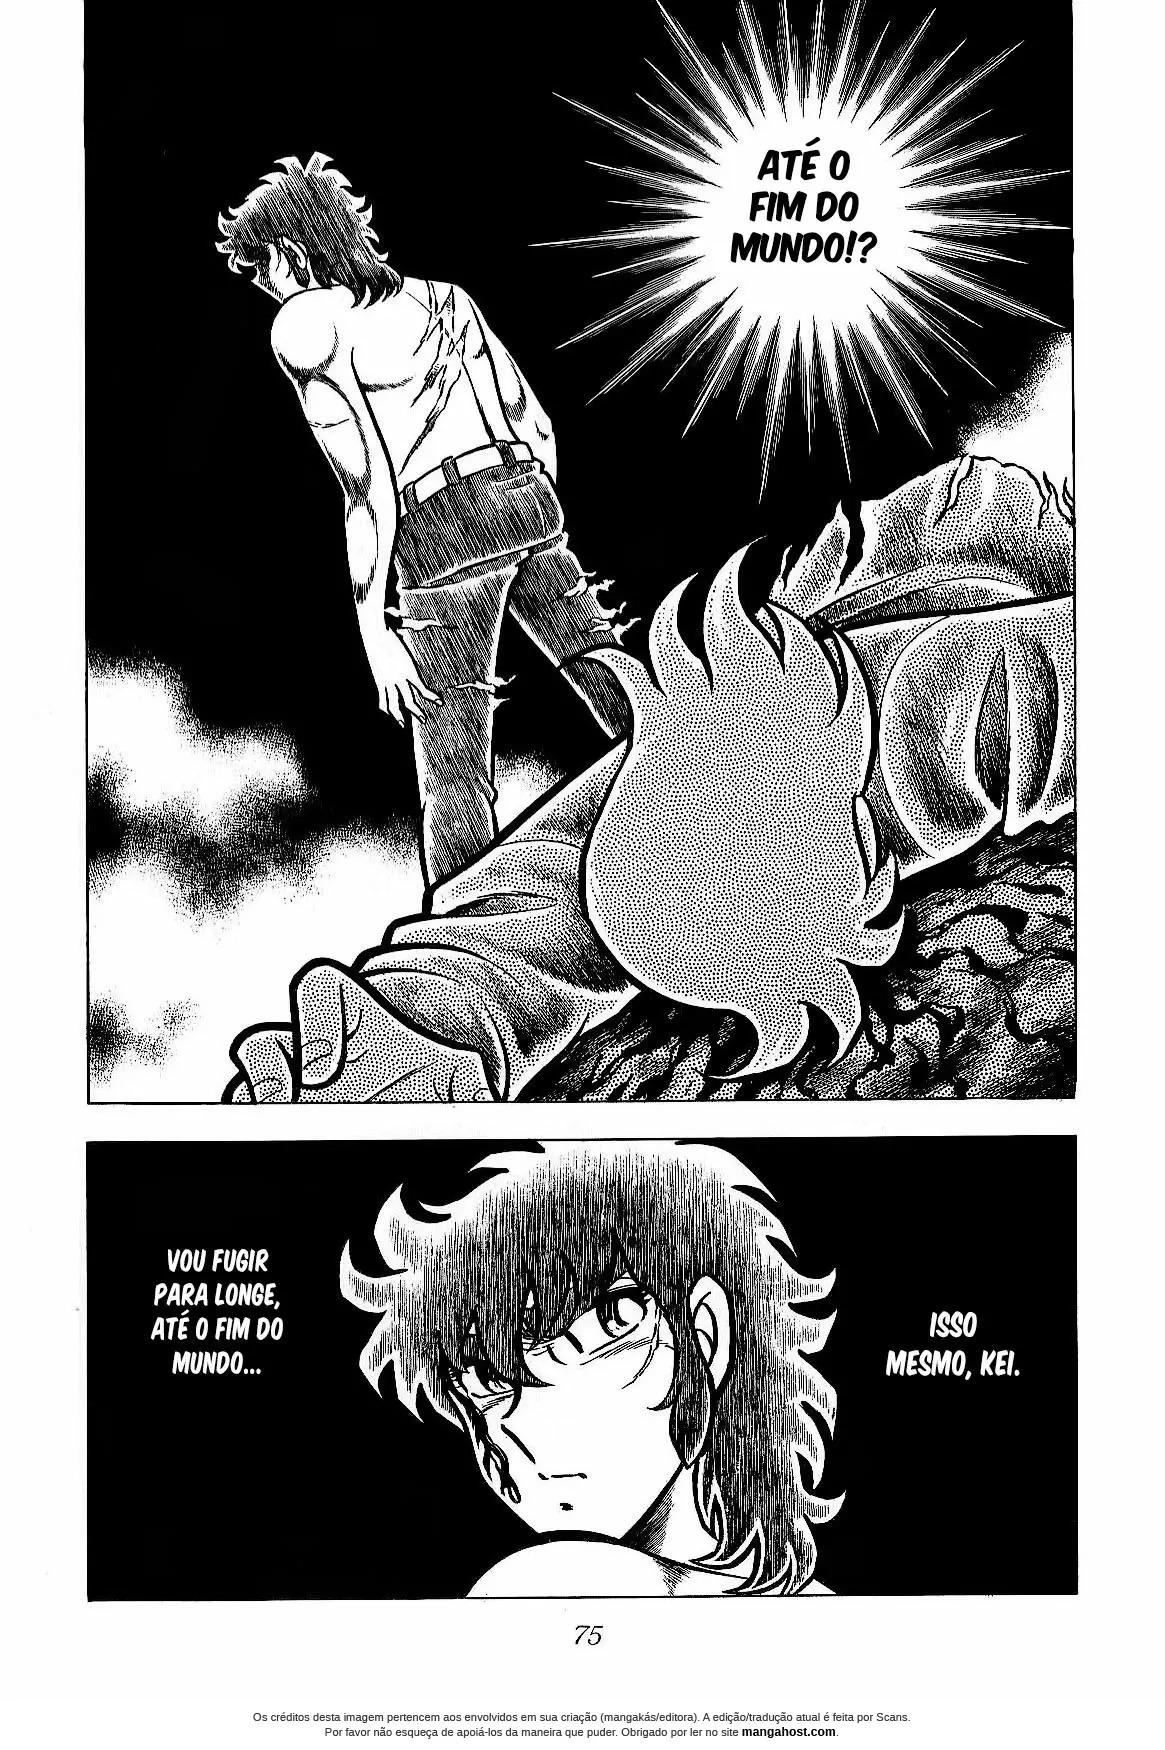 https://nine.mangadogs.com/br_manga/pic/49/6321/6492013/RaimeinoZajiCapiacutetulo1_68_782.jpg Page 69